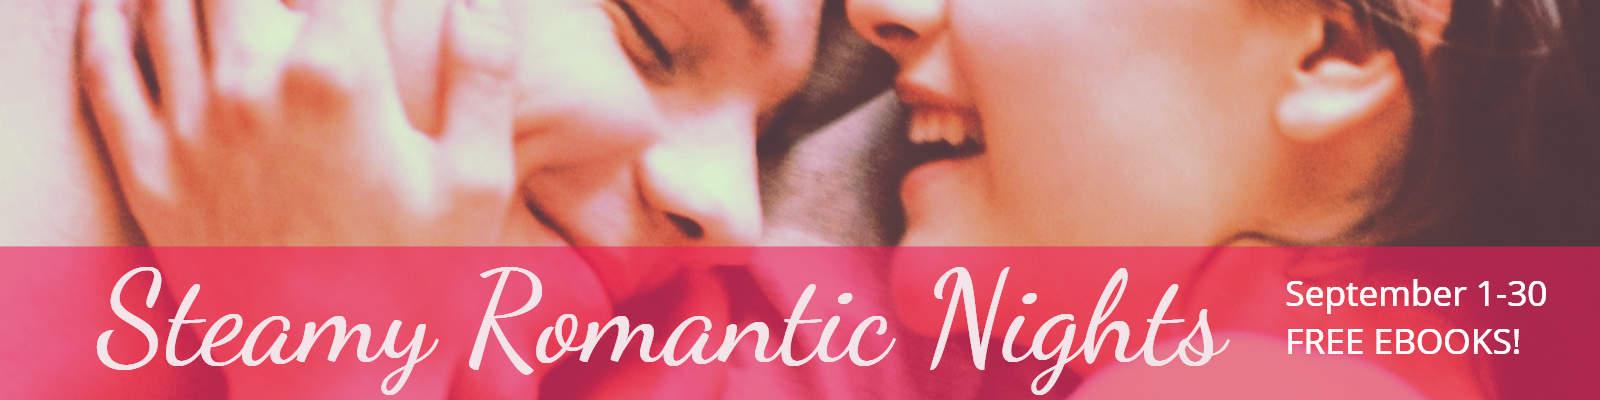 Steamy Romantic Nights